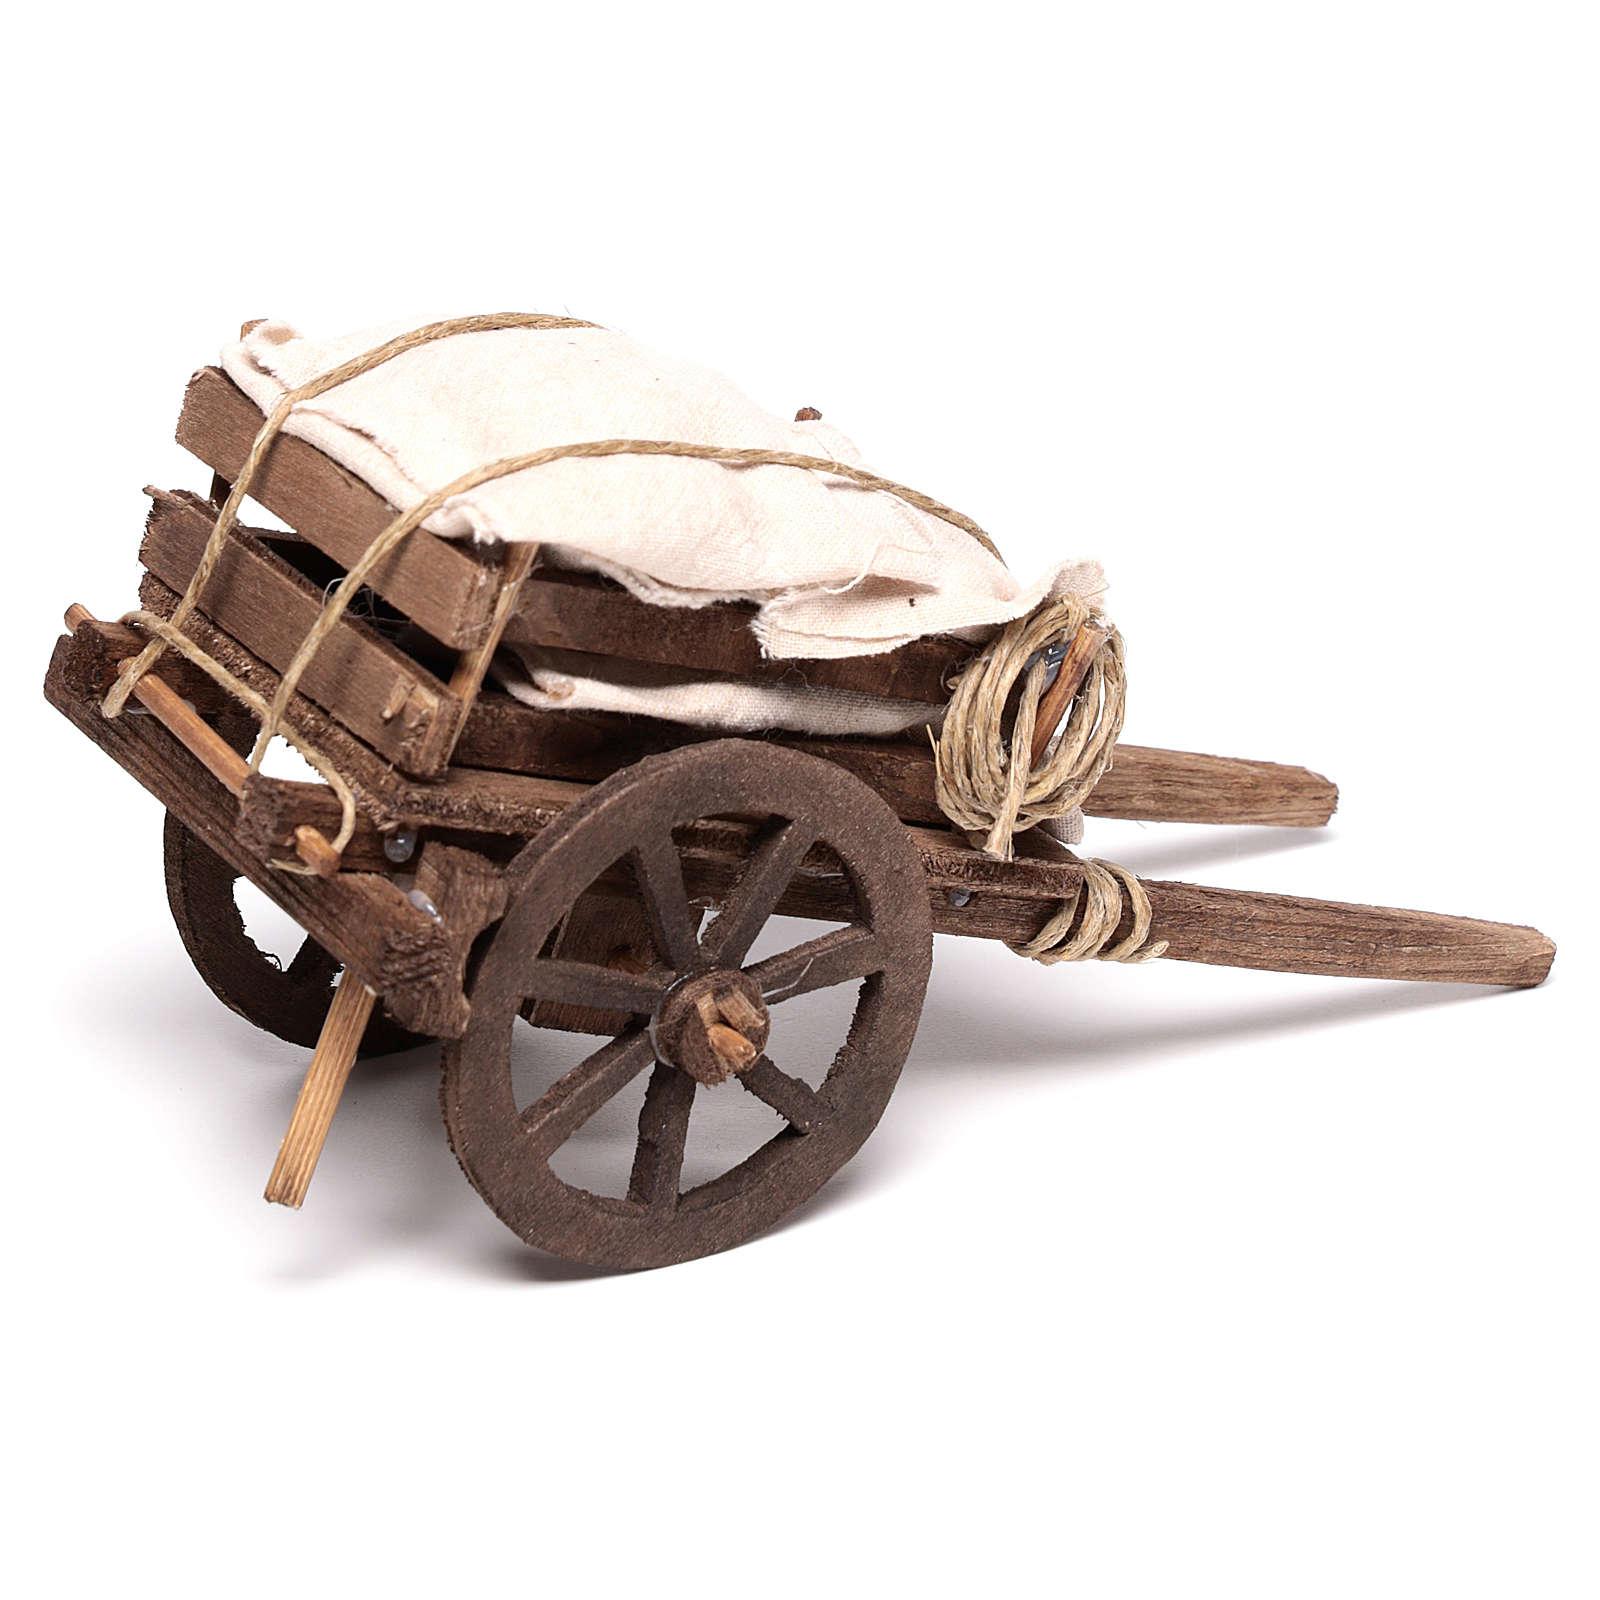 Cart with sacks, Neapolitan nativity 18x6cm 4